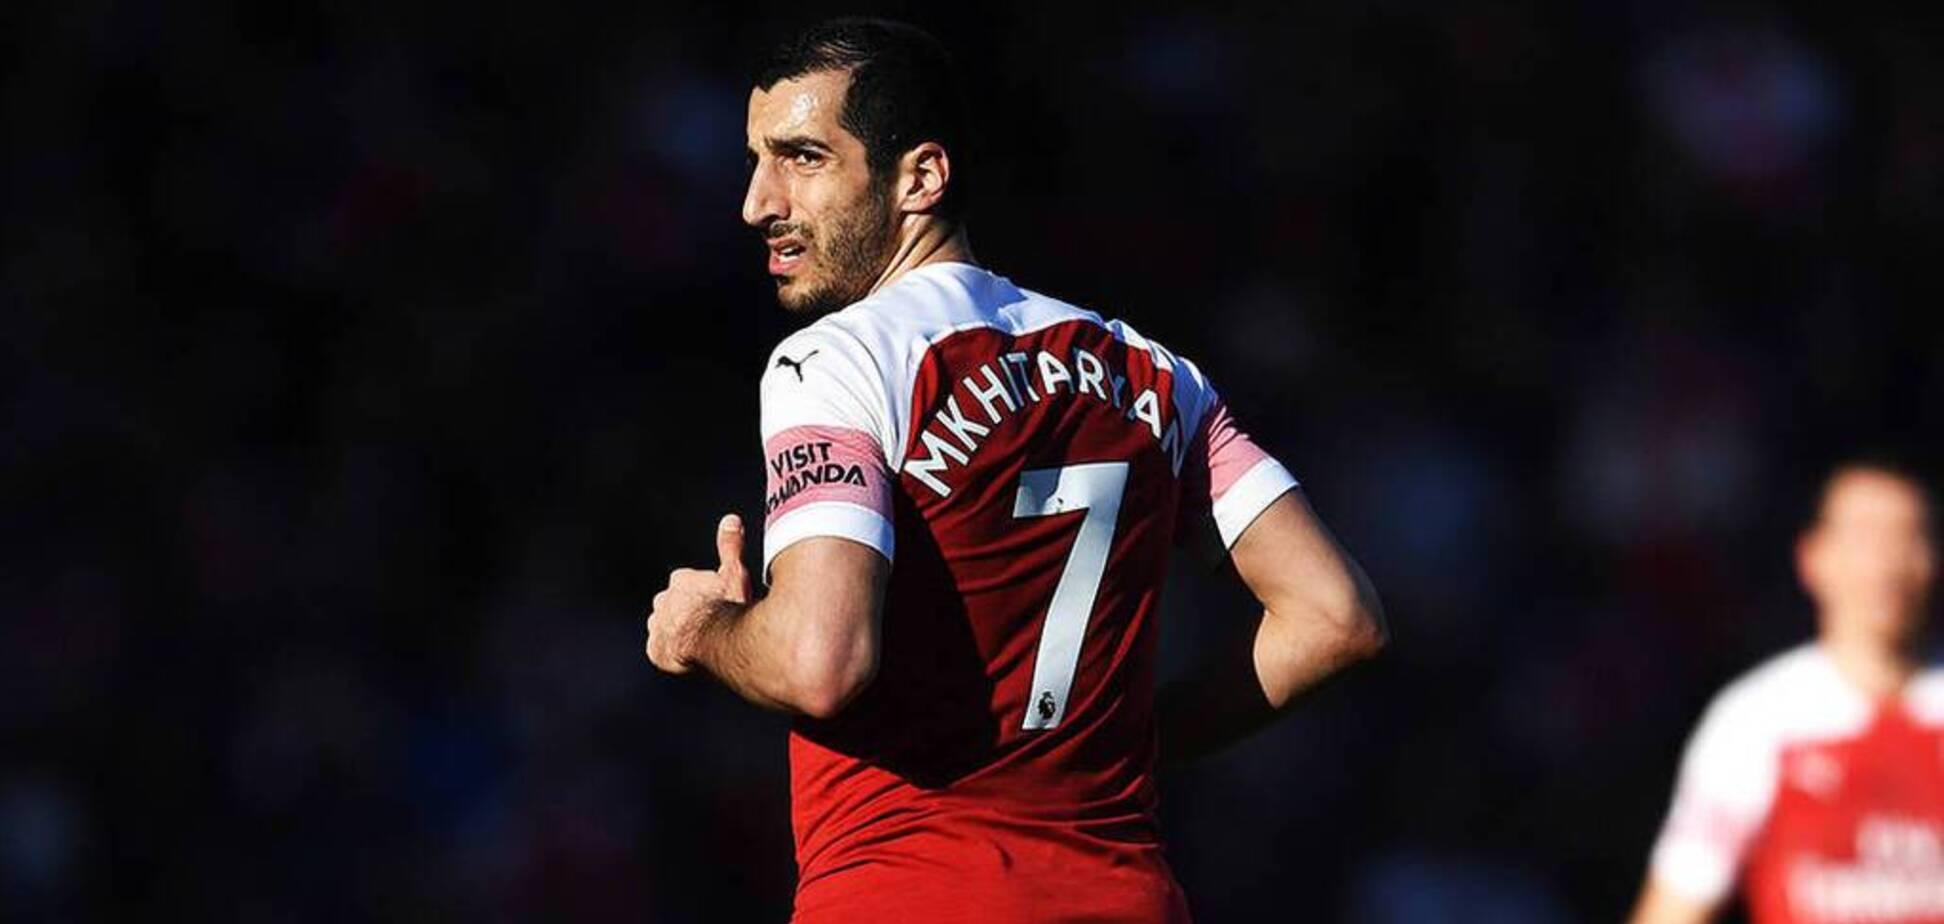 Финал Лиги Европы: 'Арсенал' сделал заявление из-за рекордсмена 'Шахтера'